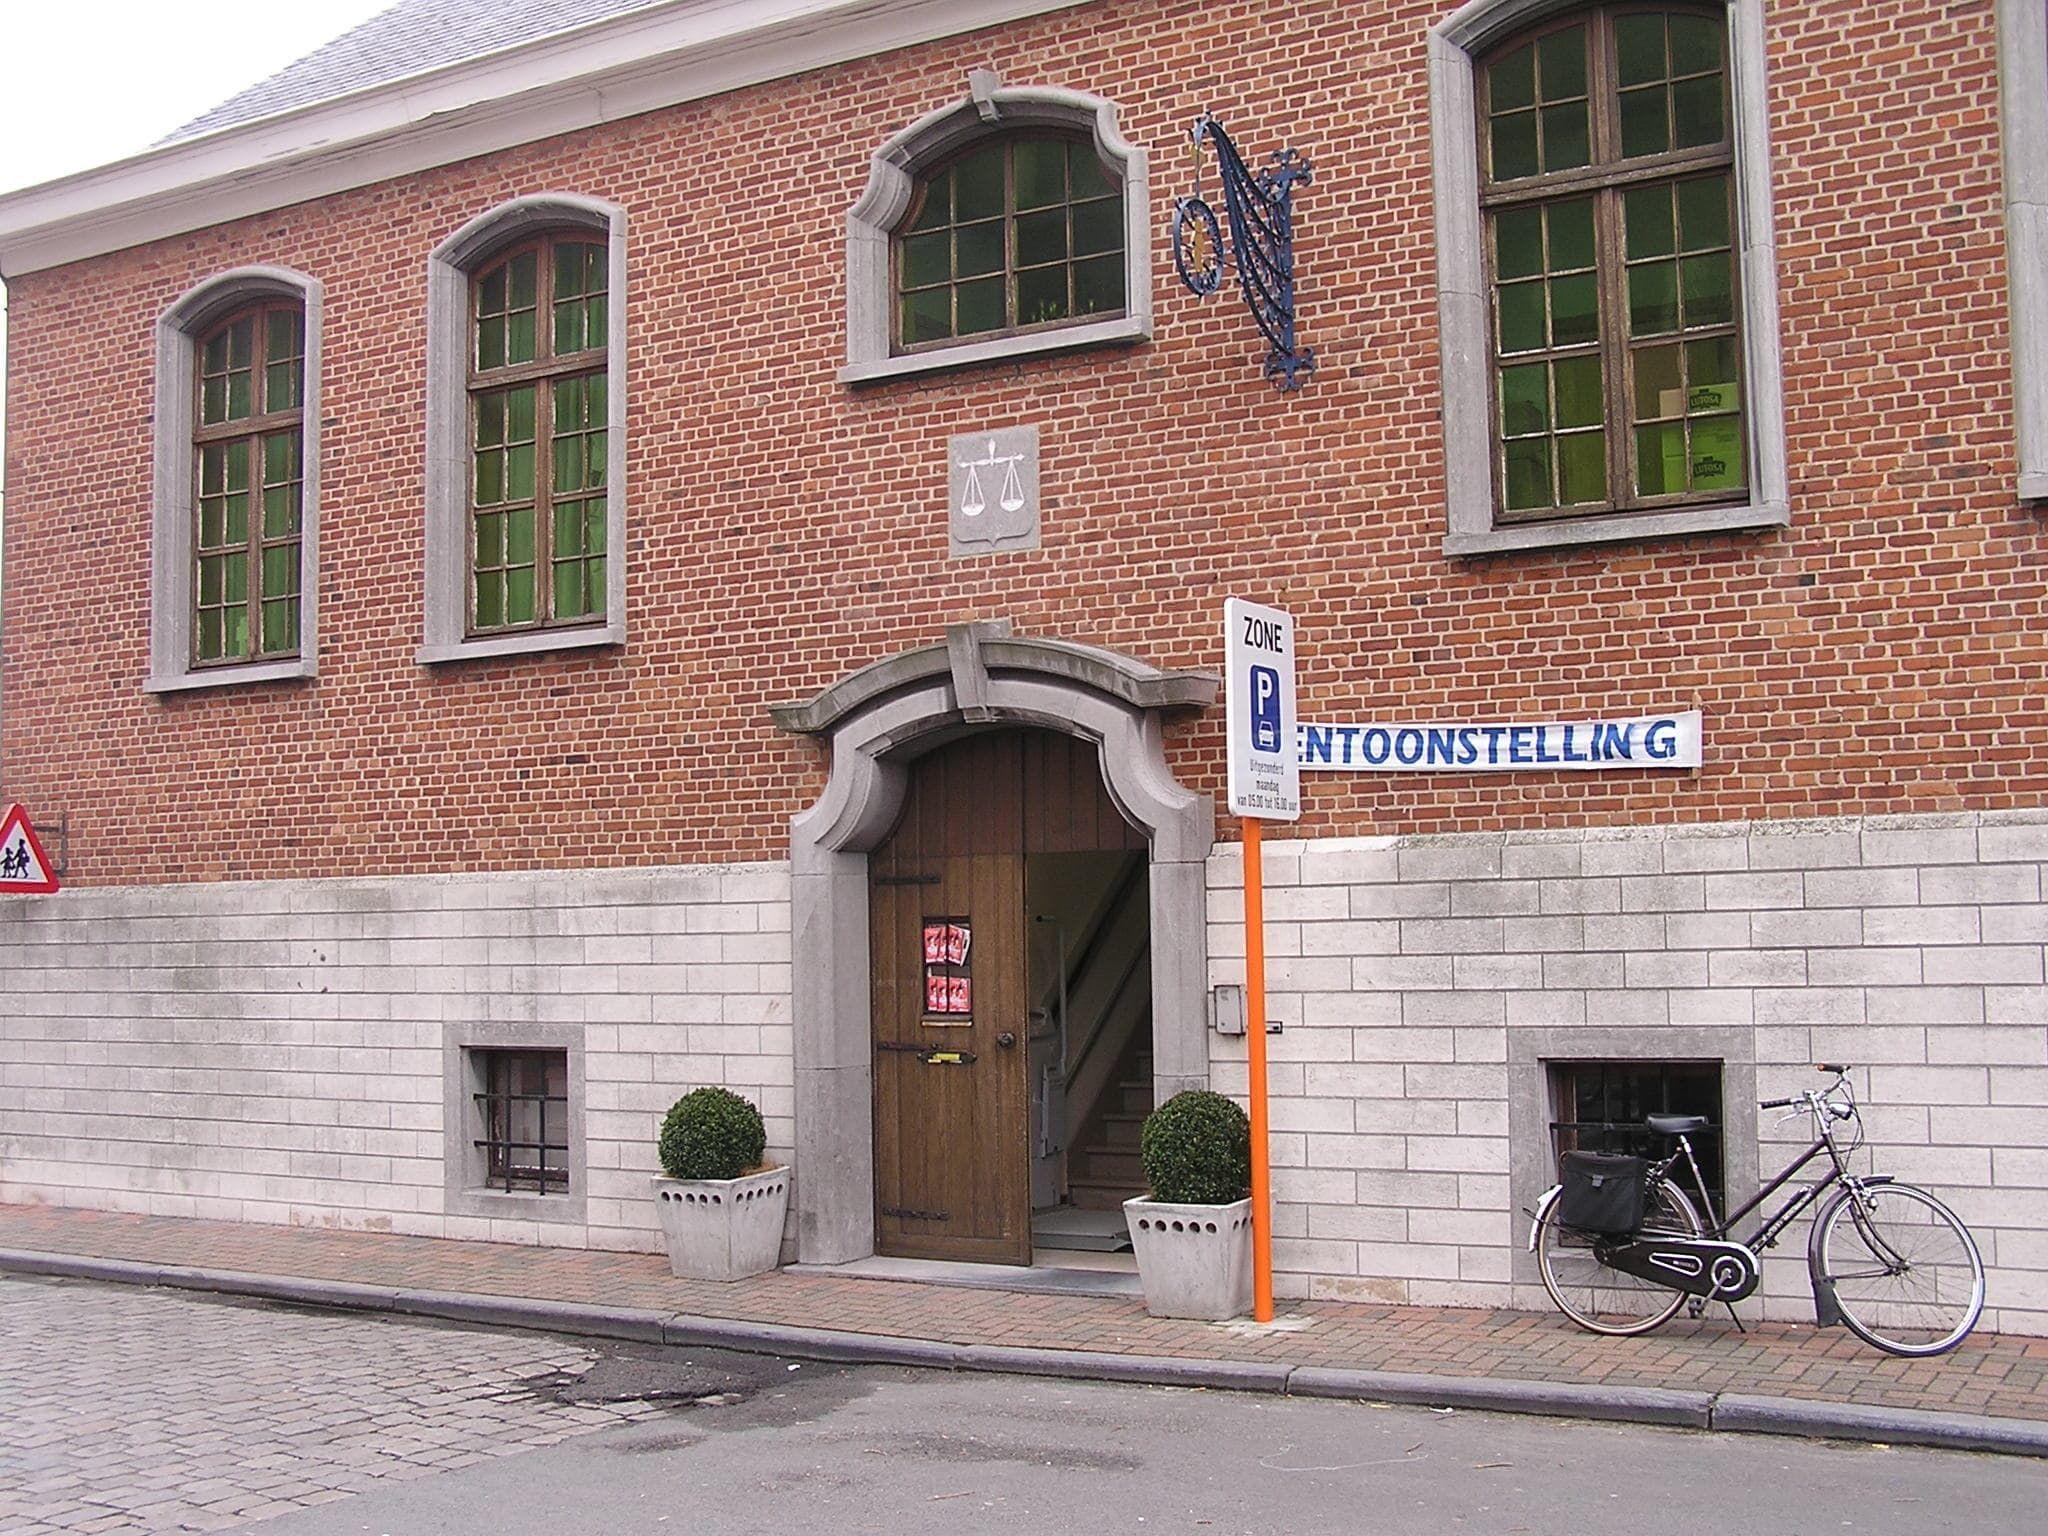 Museum Oud-Vredegerecht